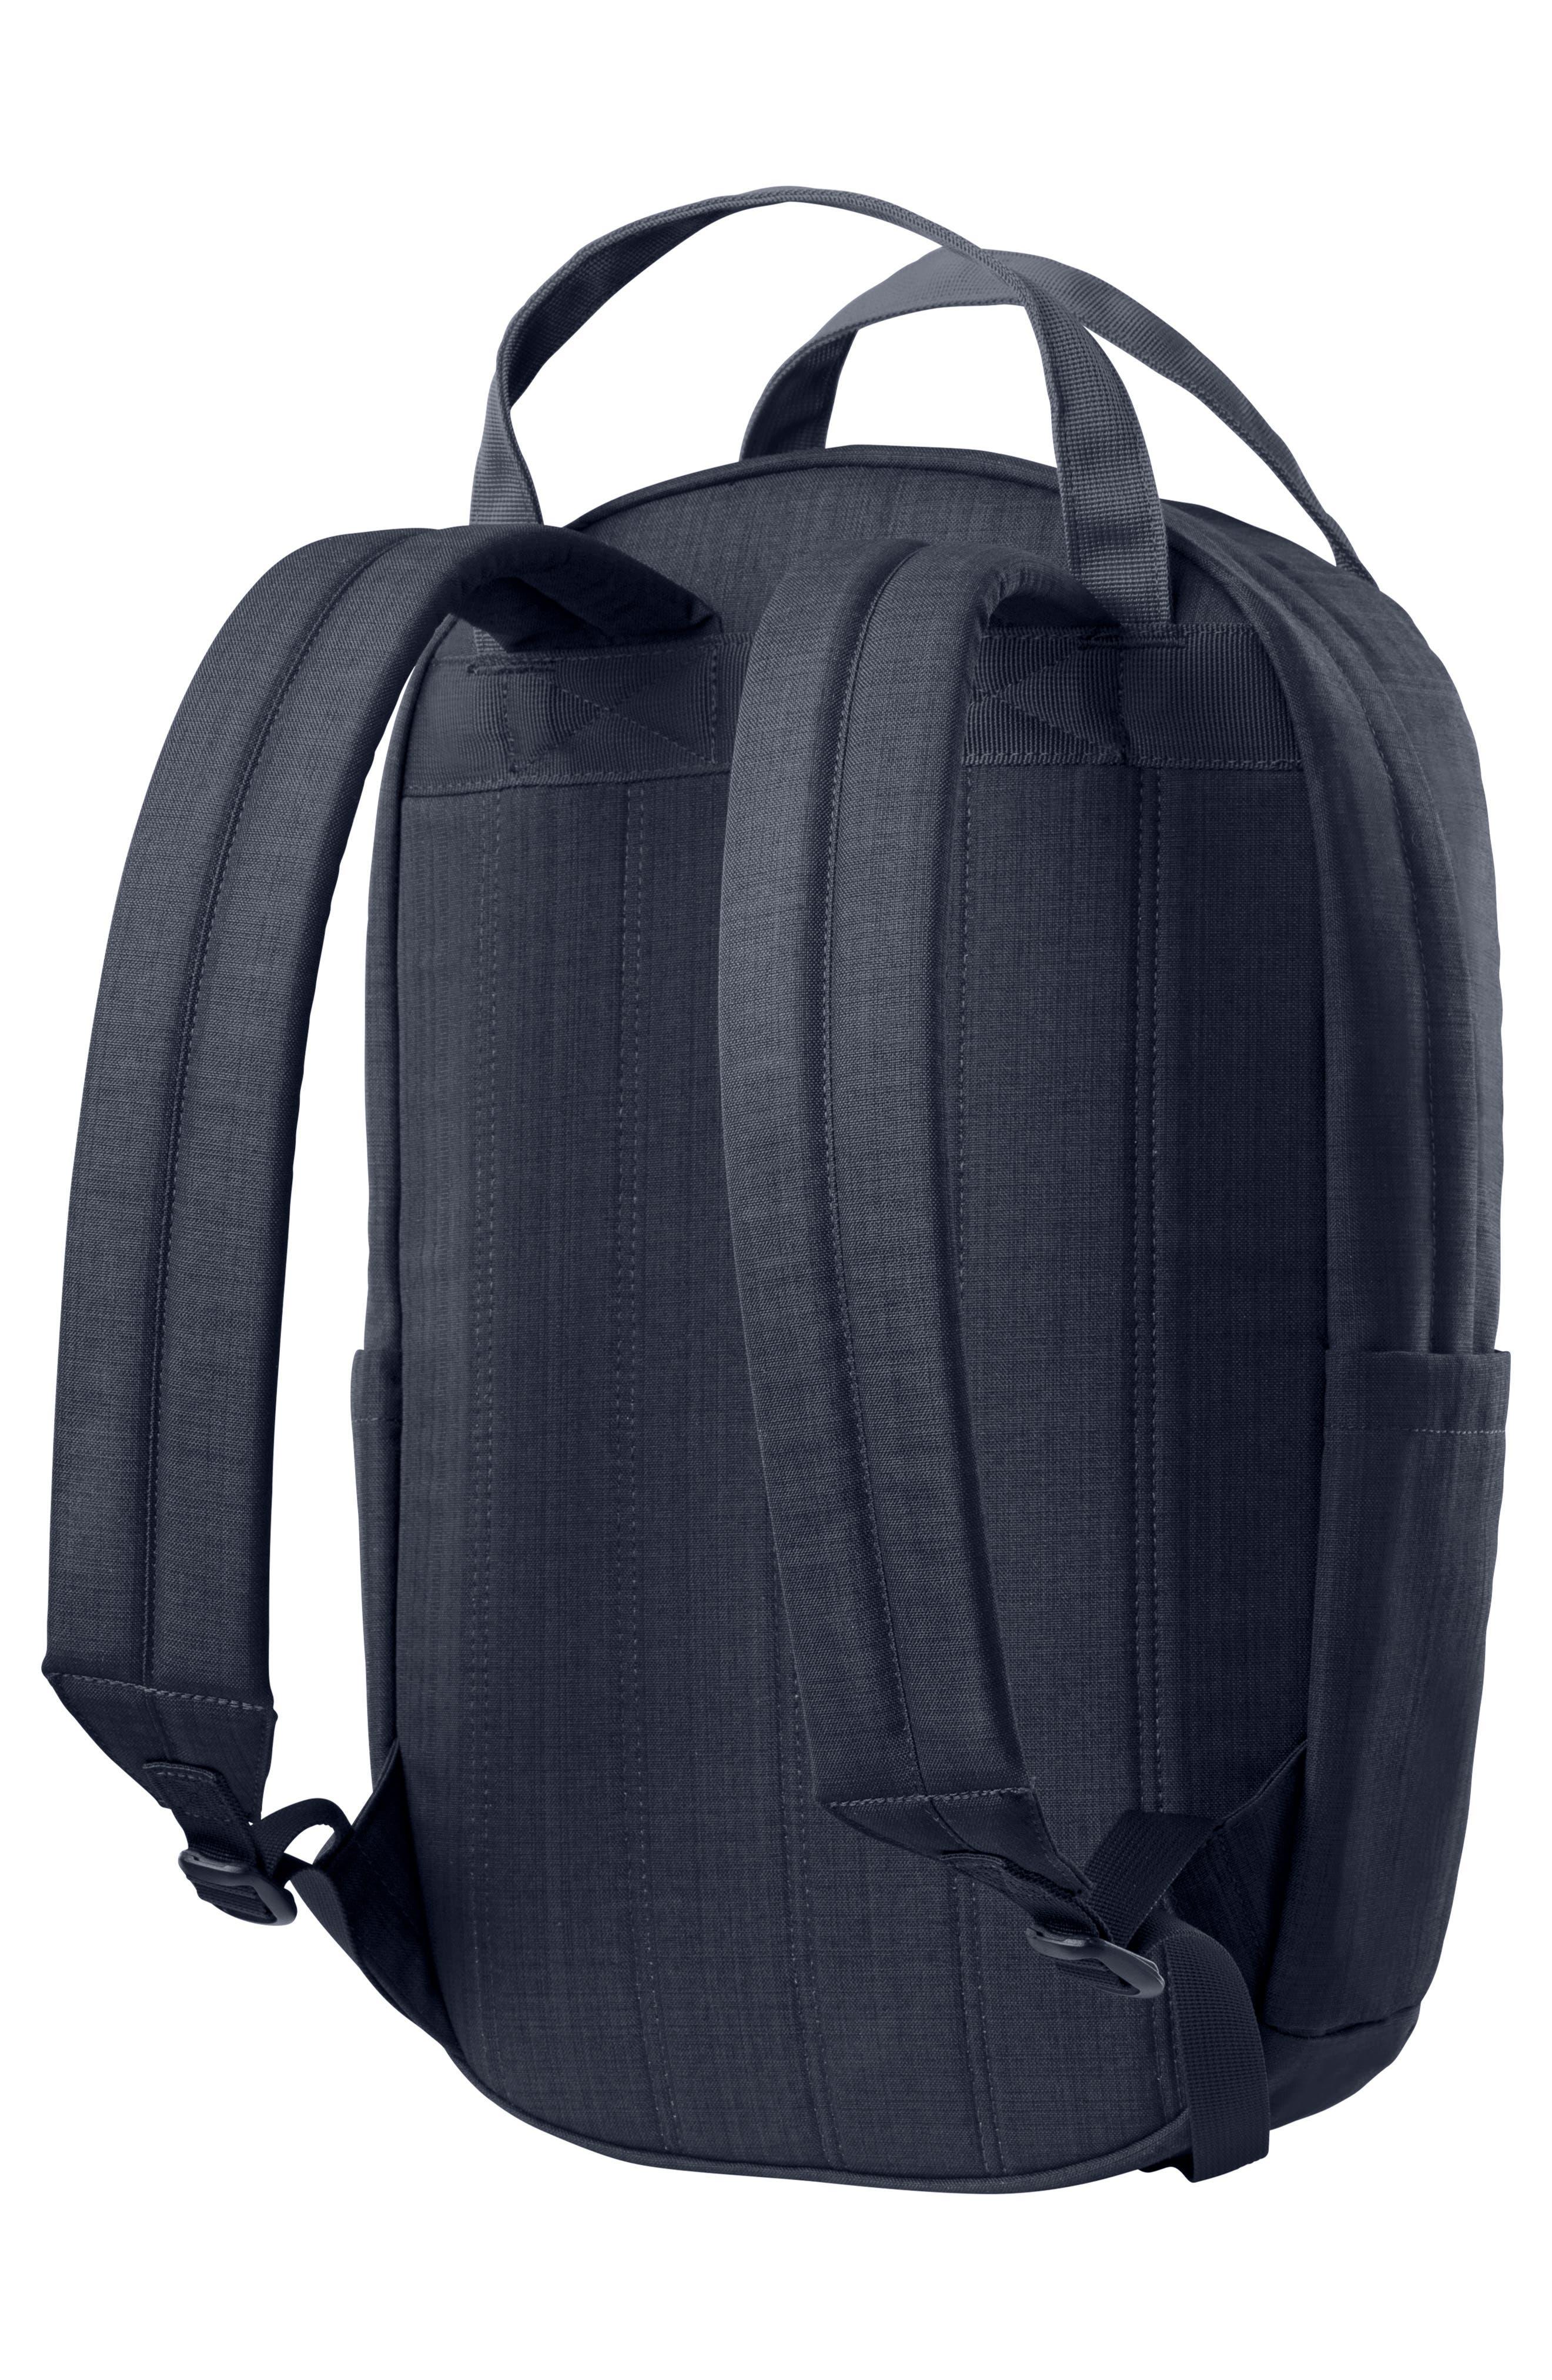 Oslo Backpack,                             Alternate thumbnail 2, color,                             GRAPHITE BLUE